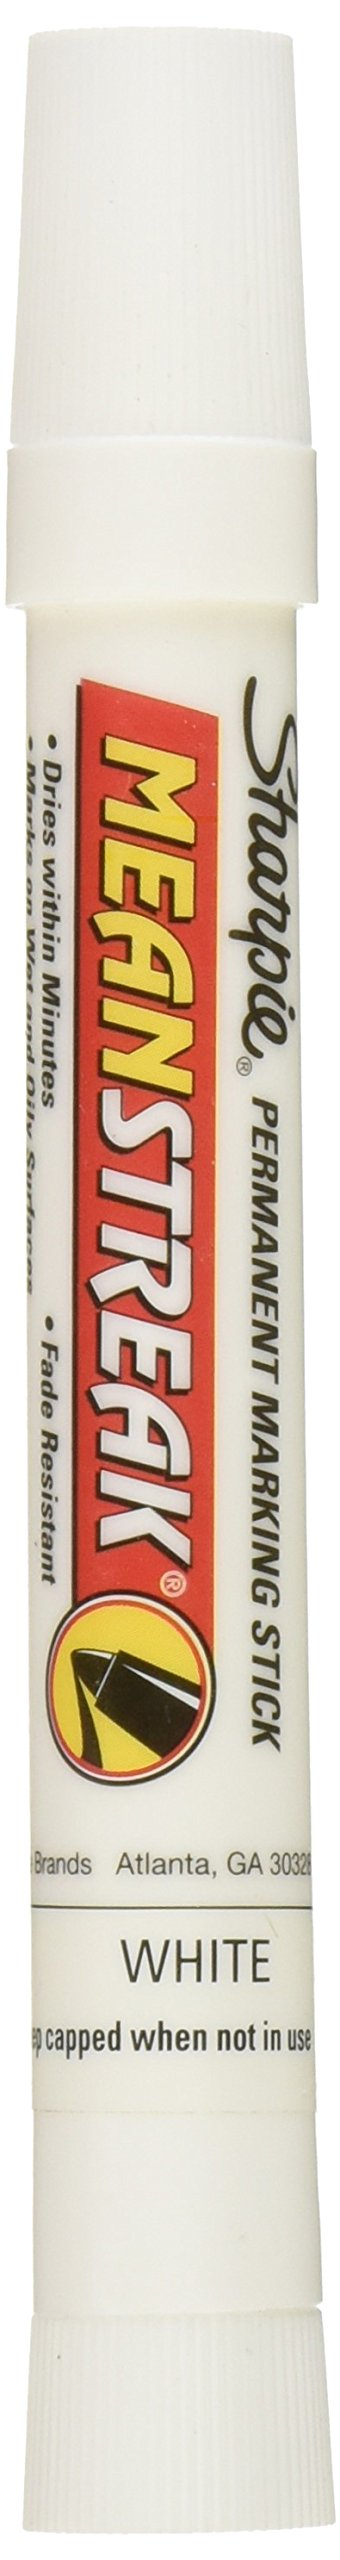 Sharpie Mean Streak Permanent Marking Stick, Bullet Tip, White (Pack of 12) - 85018